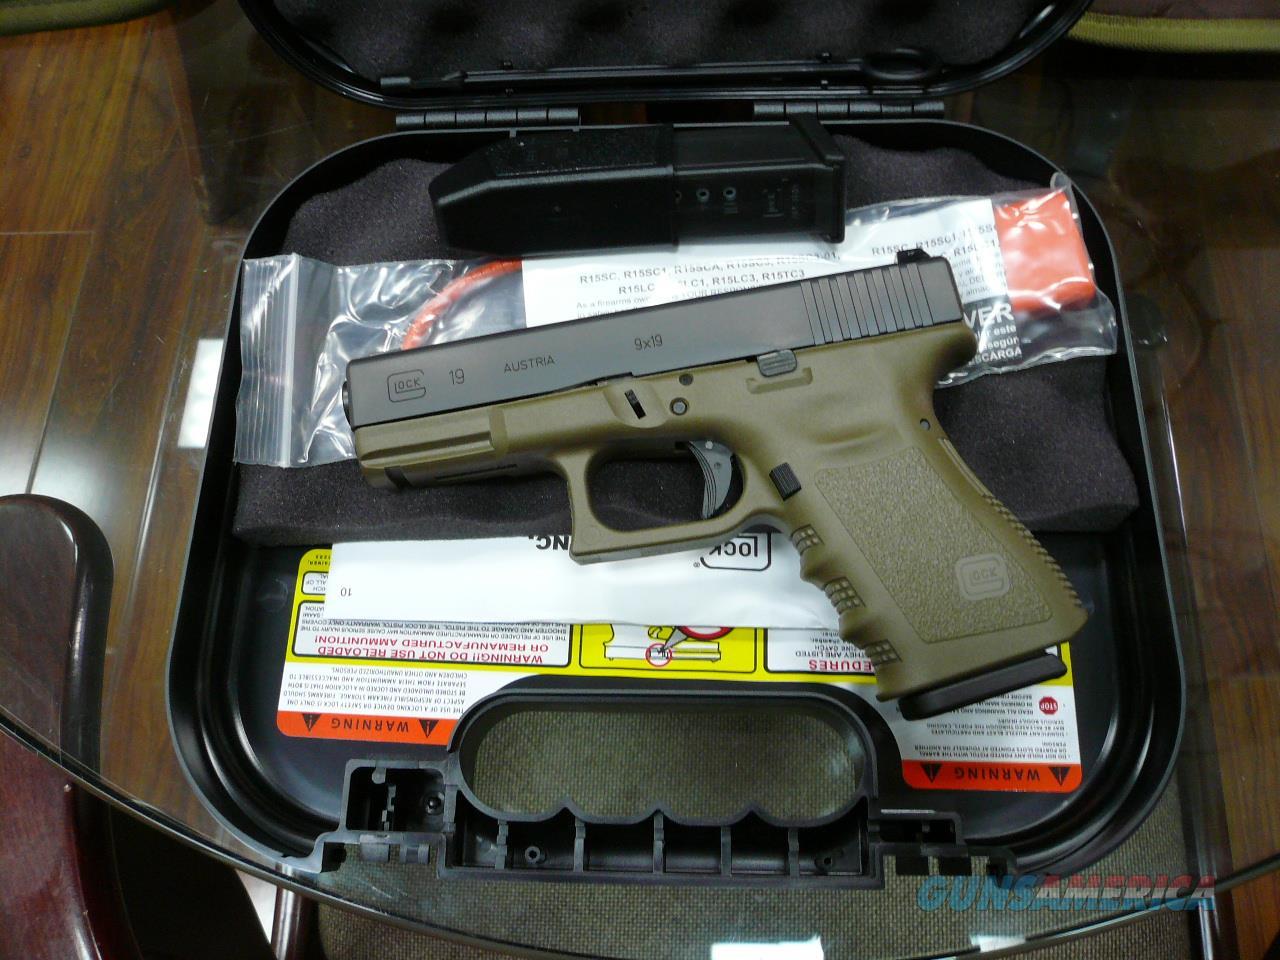 19-OD,NIB  Guns > Pistols > Glock Pistols > 19